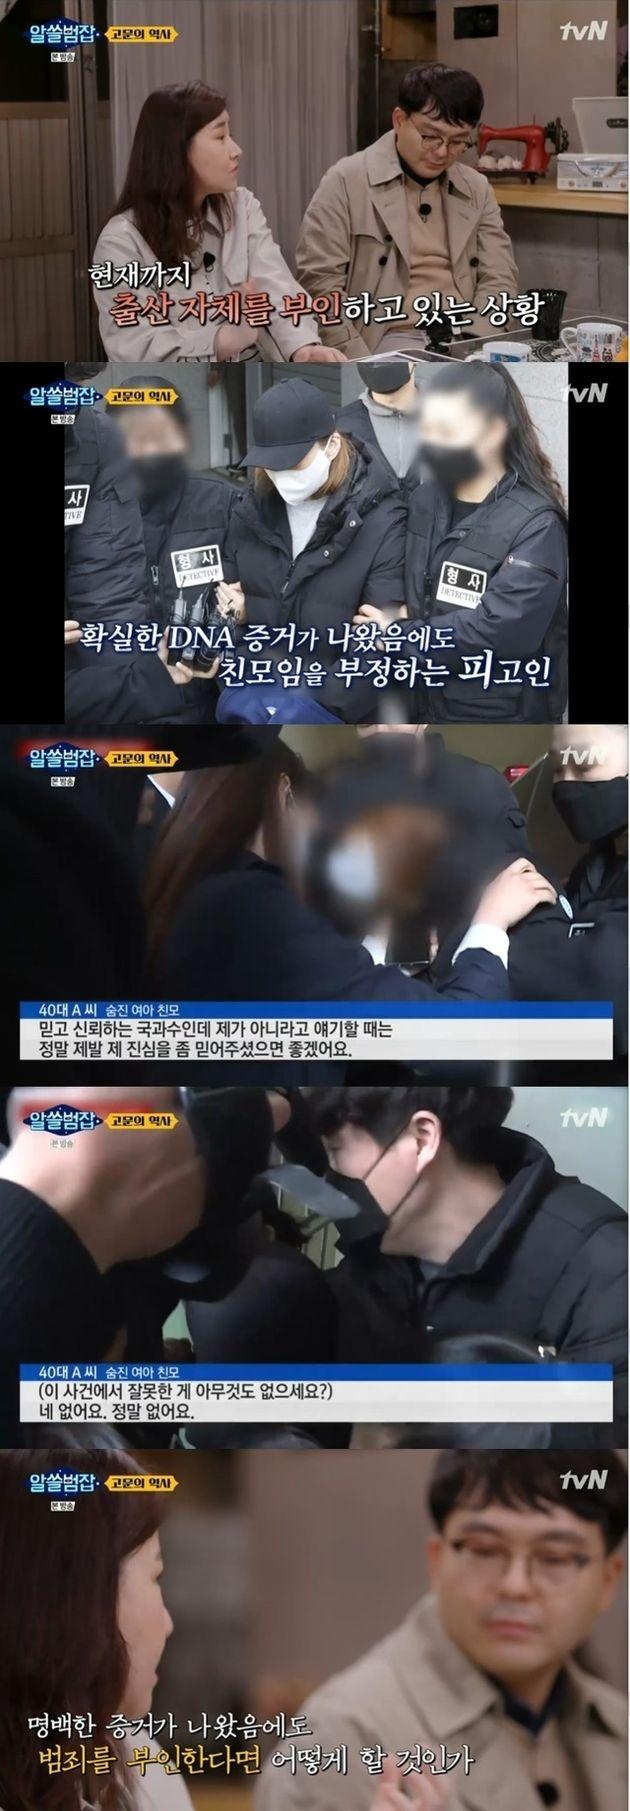 tvN '알아두면 쓸데있는 범죄 잡학사전